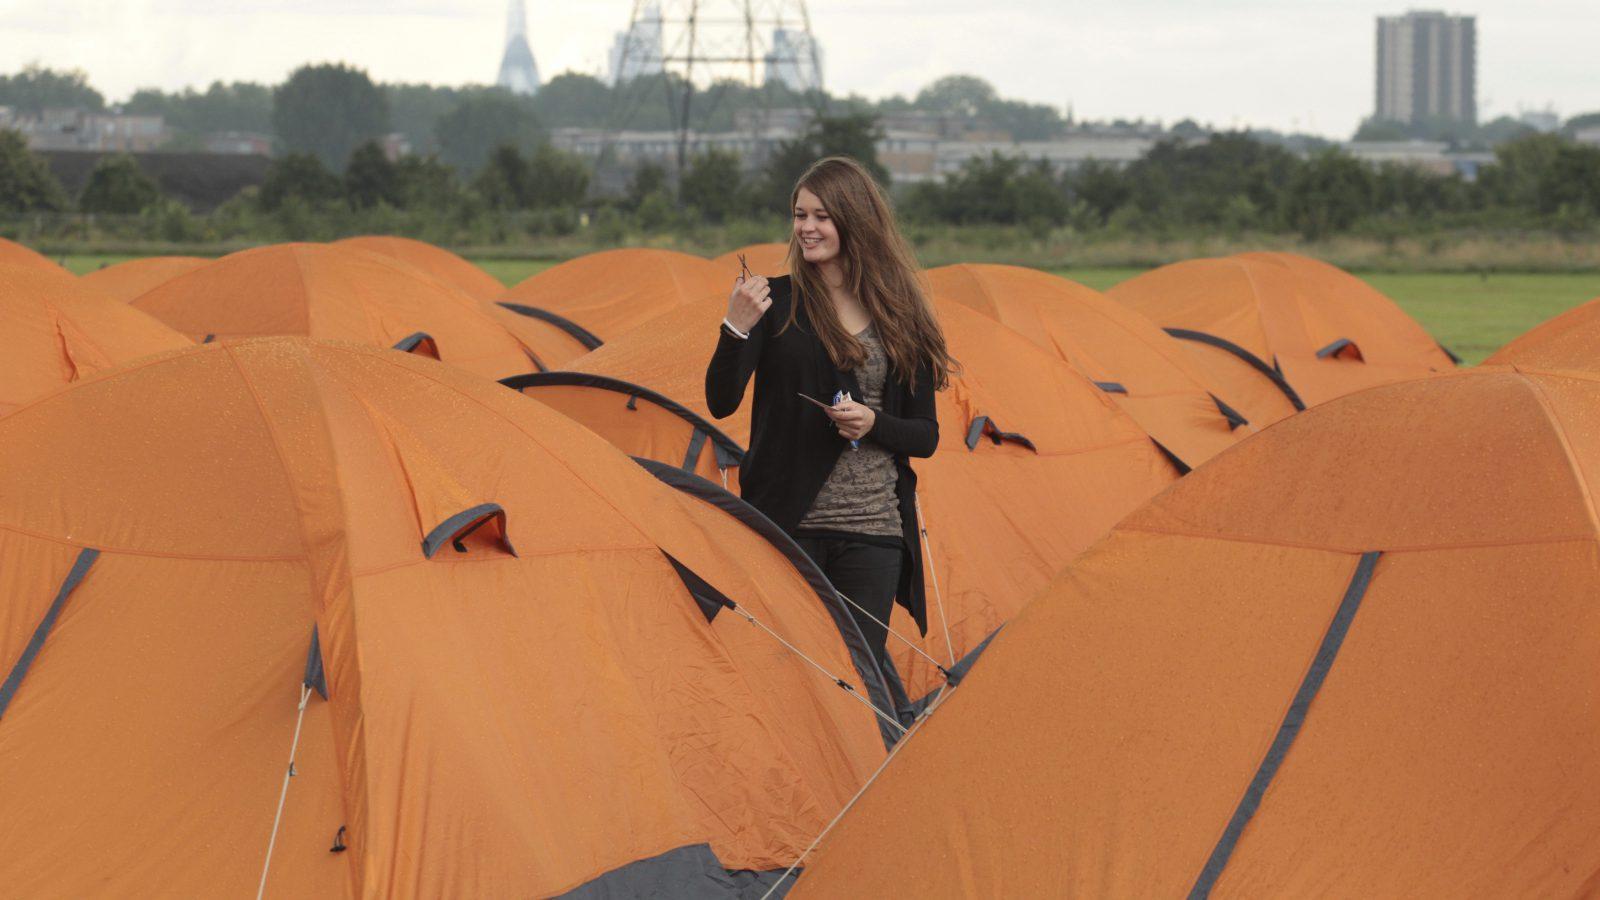 Volunteer at Olympic campsite.